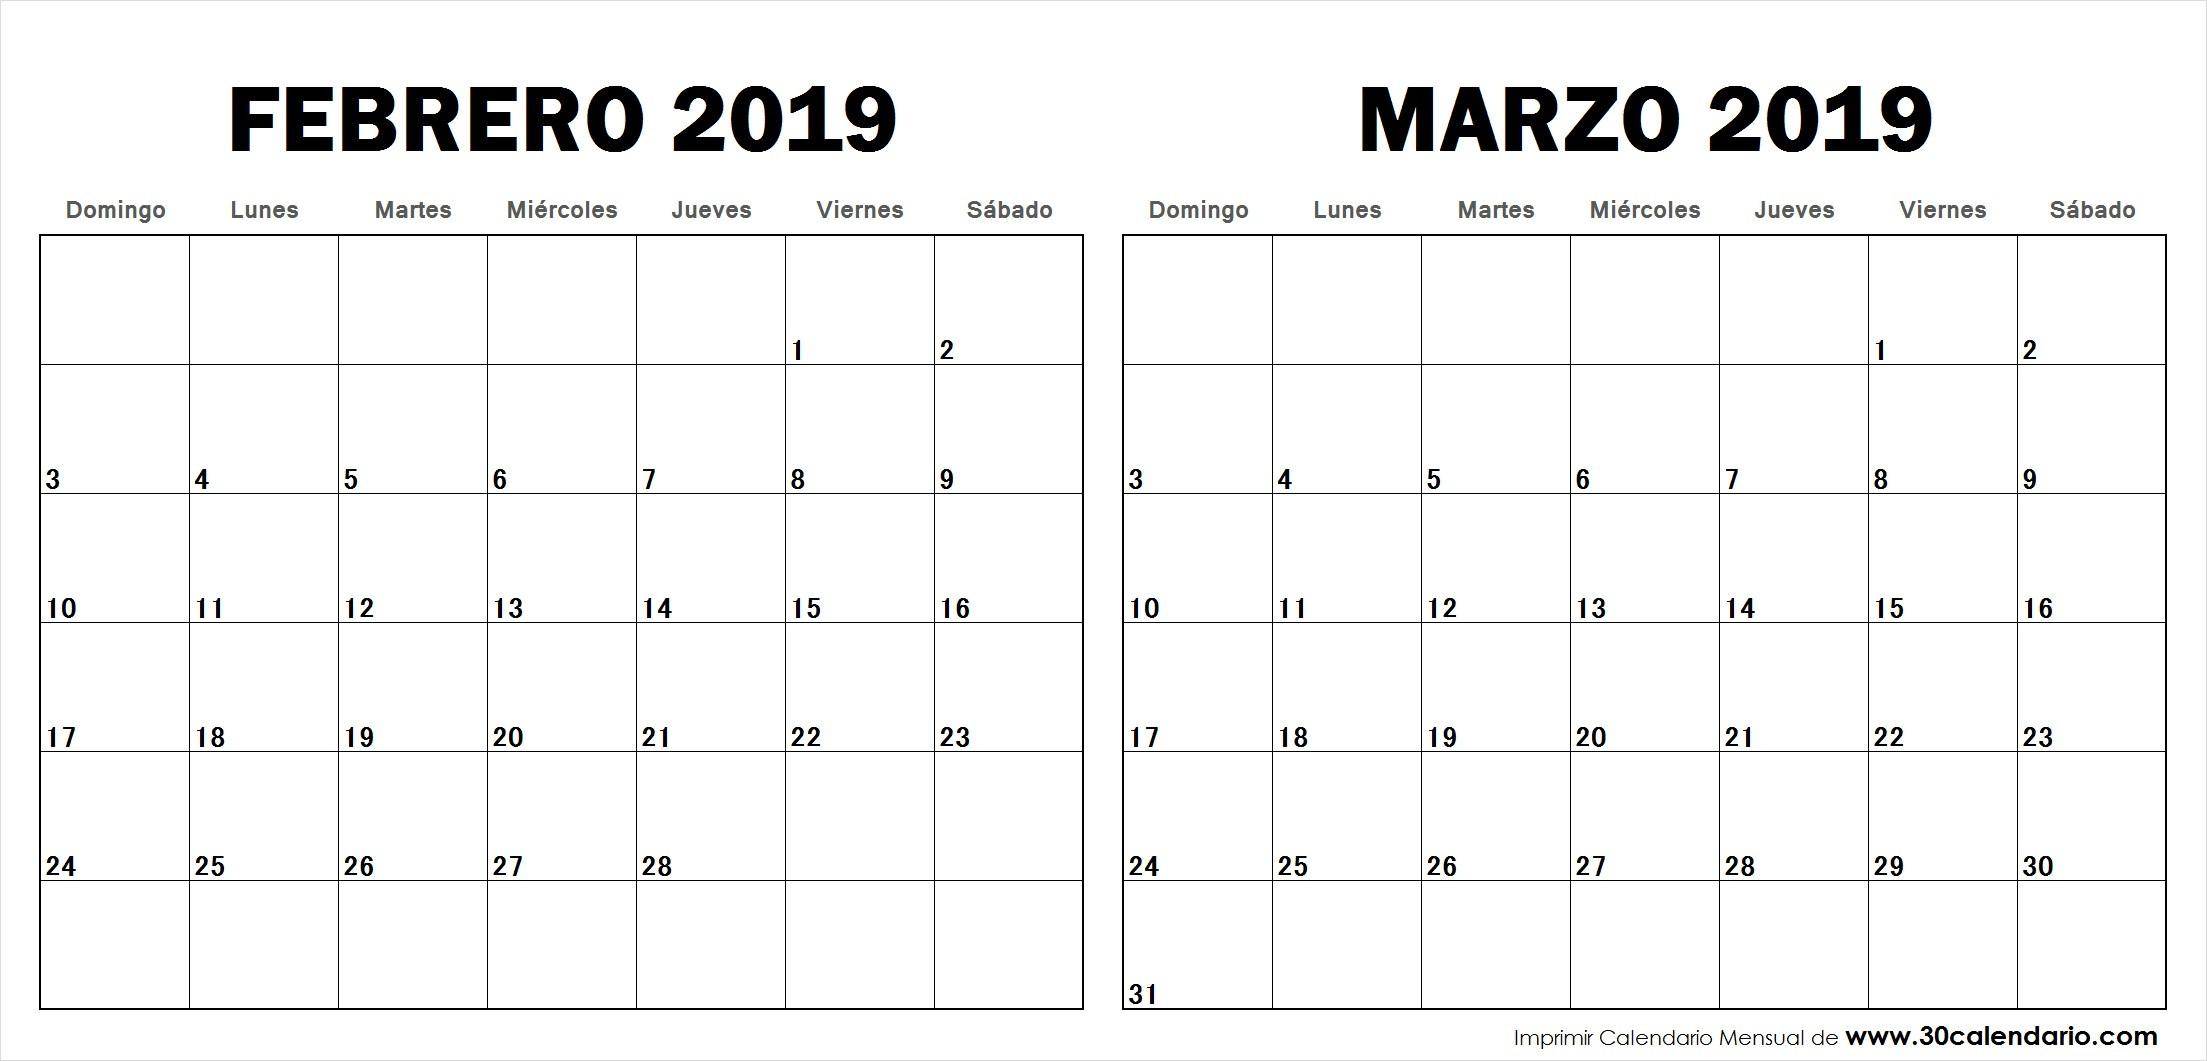 Calendario 2019 Para Imprimir Con Feriados Ecuador Más Reciente Calendario Marzo 2019 Modelo Best Reviews 2019 Newletterjdi